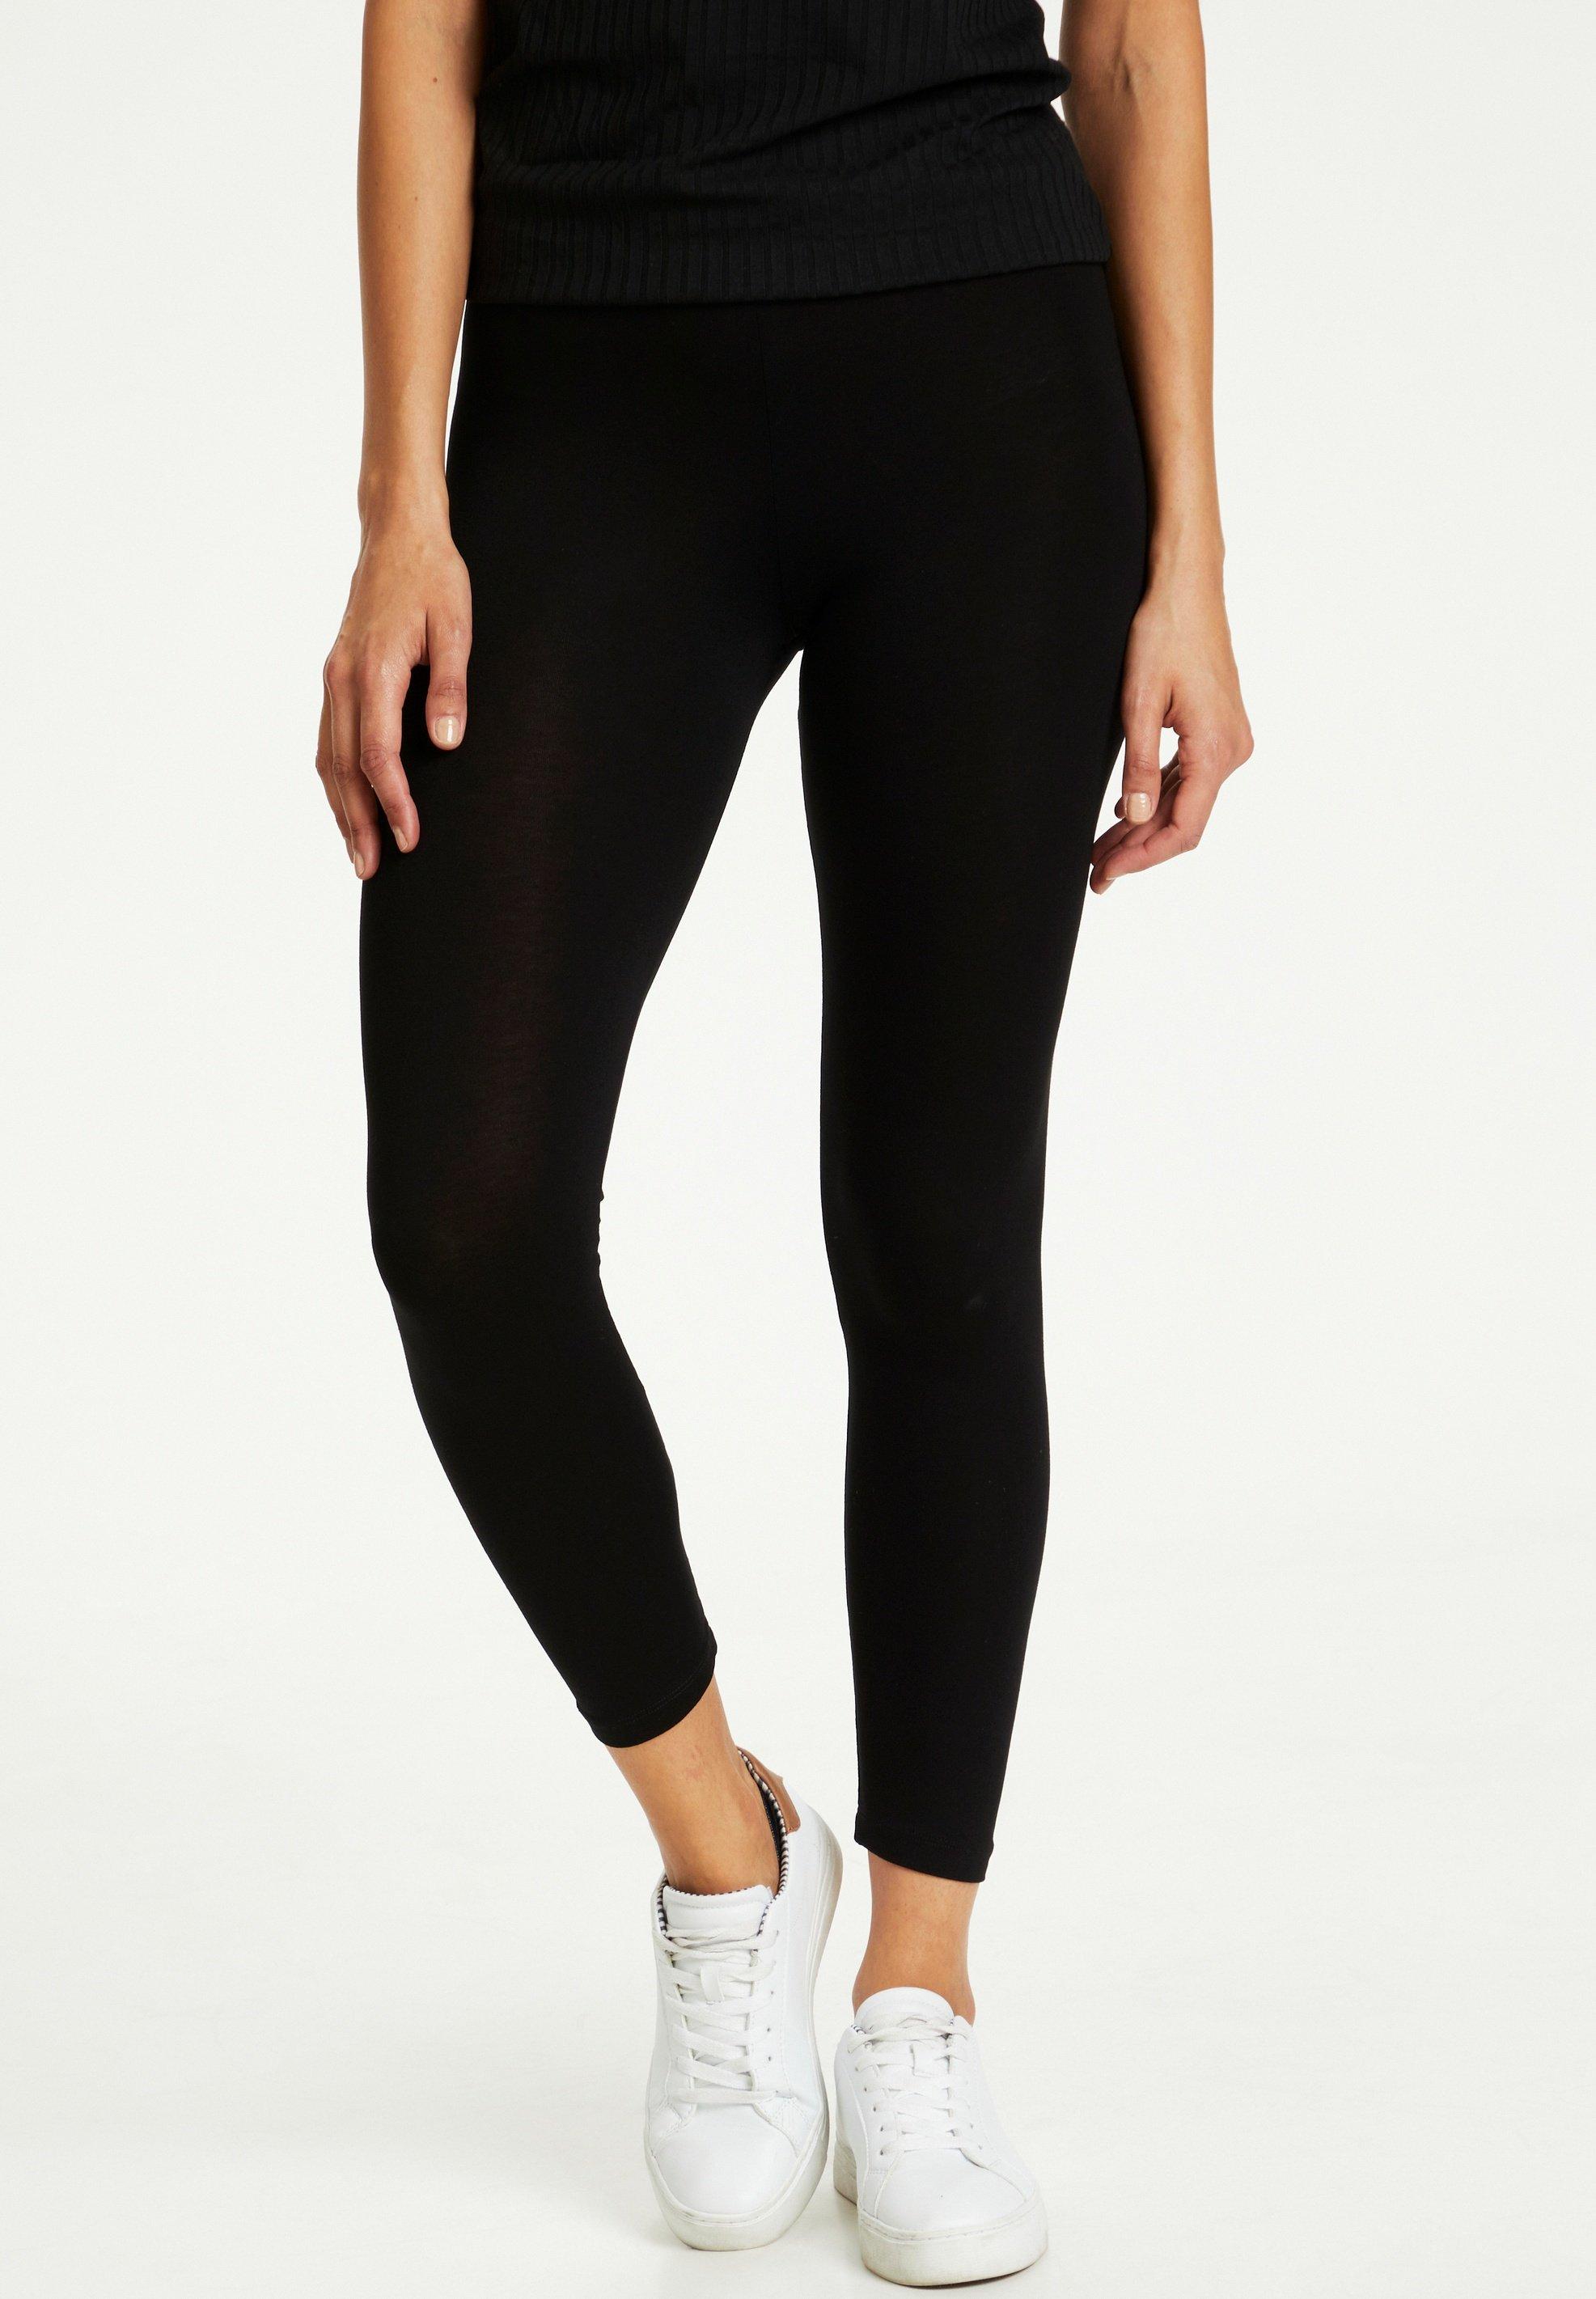 Damen KAGILA  - Leggings - Hosen